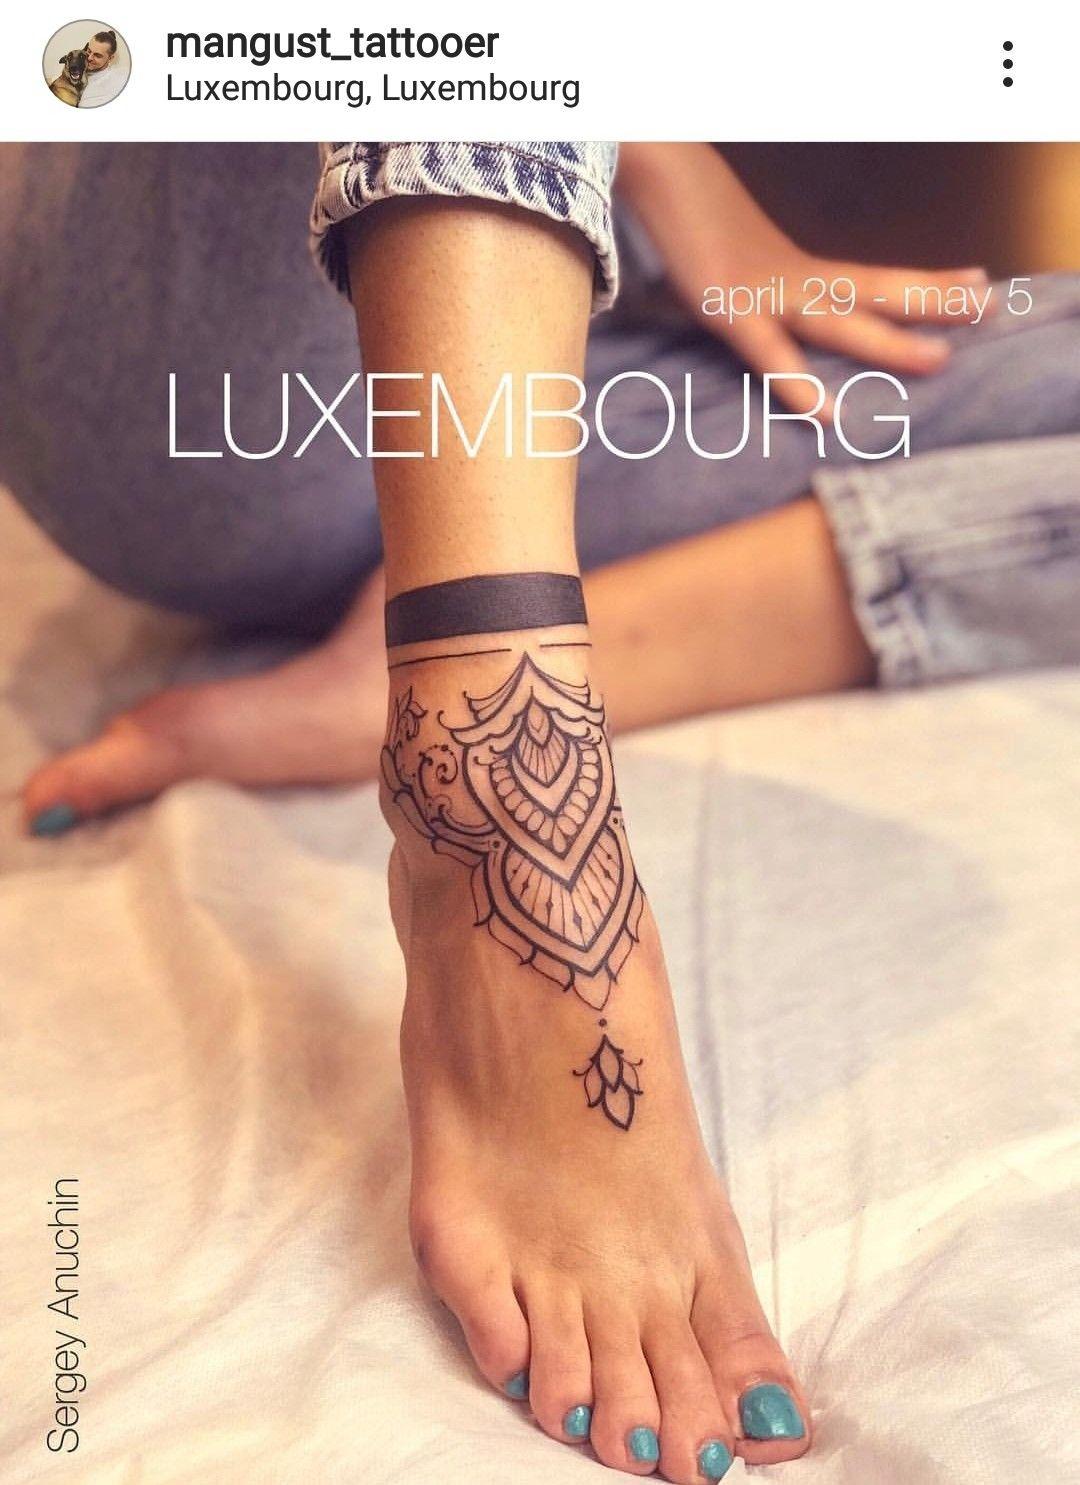 Pin By Johanna Sinkkonen On Cool Tattoos Henna Tattoo Foot Foot Tattoos For Women Ankle Tattoos For Women